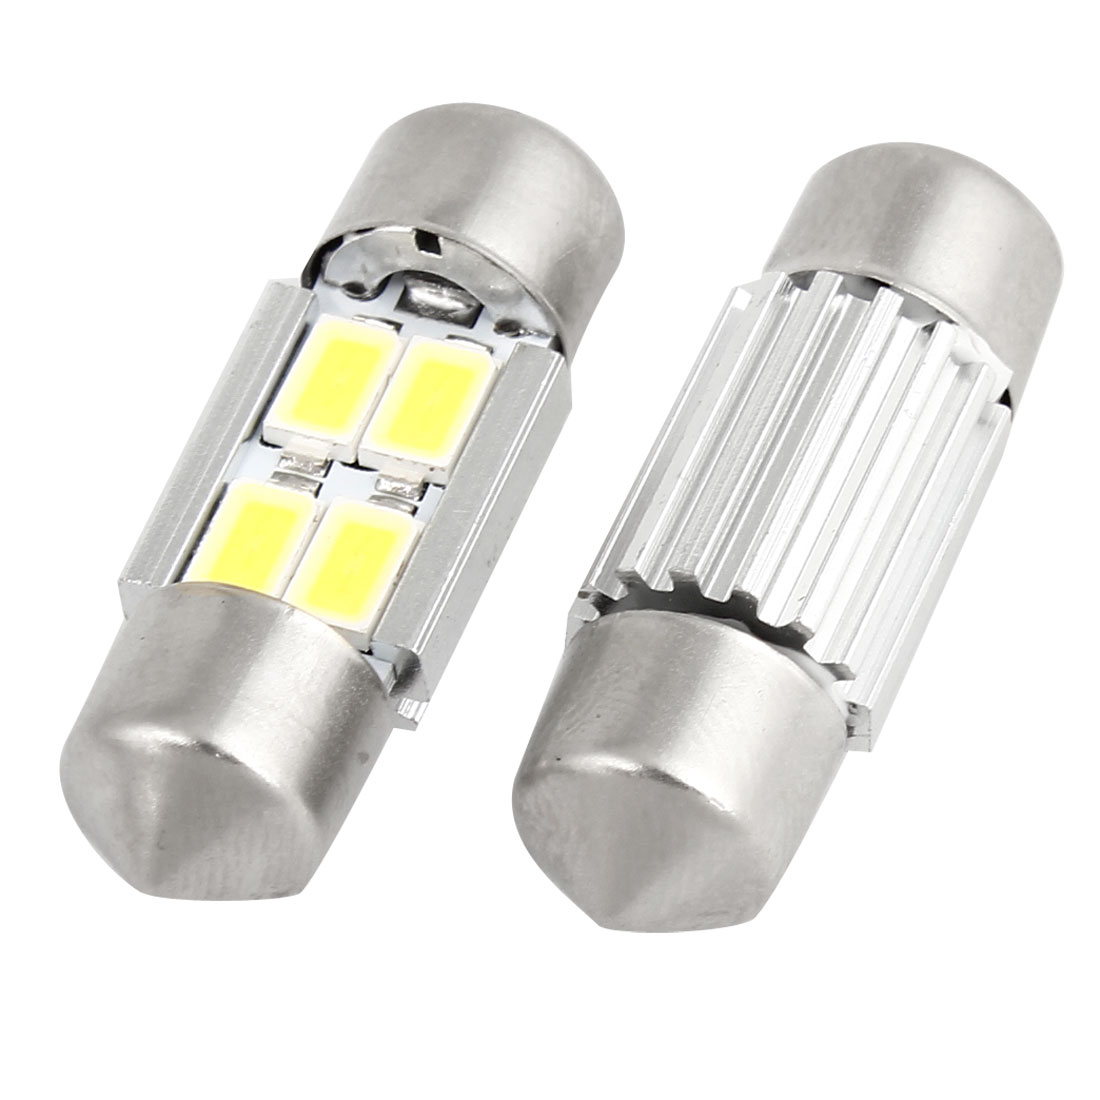 2 Pcs Cambus 31mm White 5630 SMD 4-LED Festoon Dome Light Bulbs Map Lamp internal